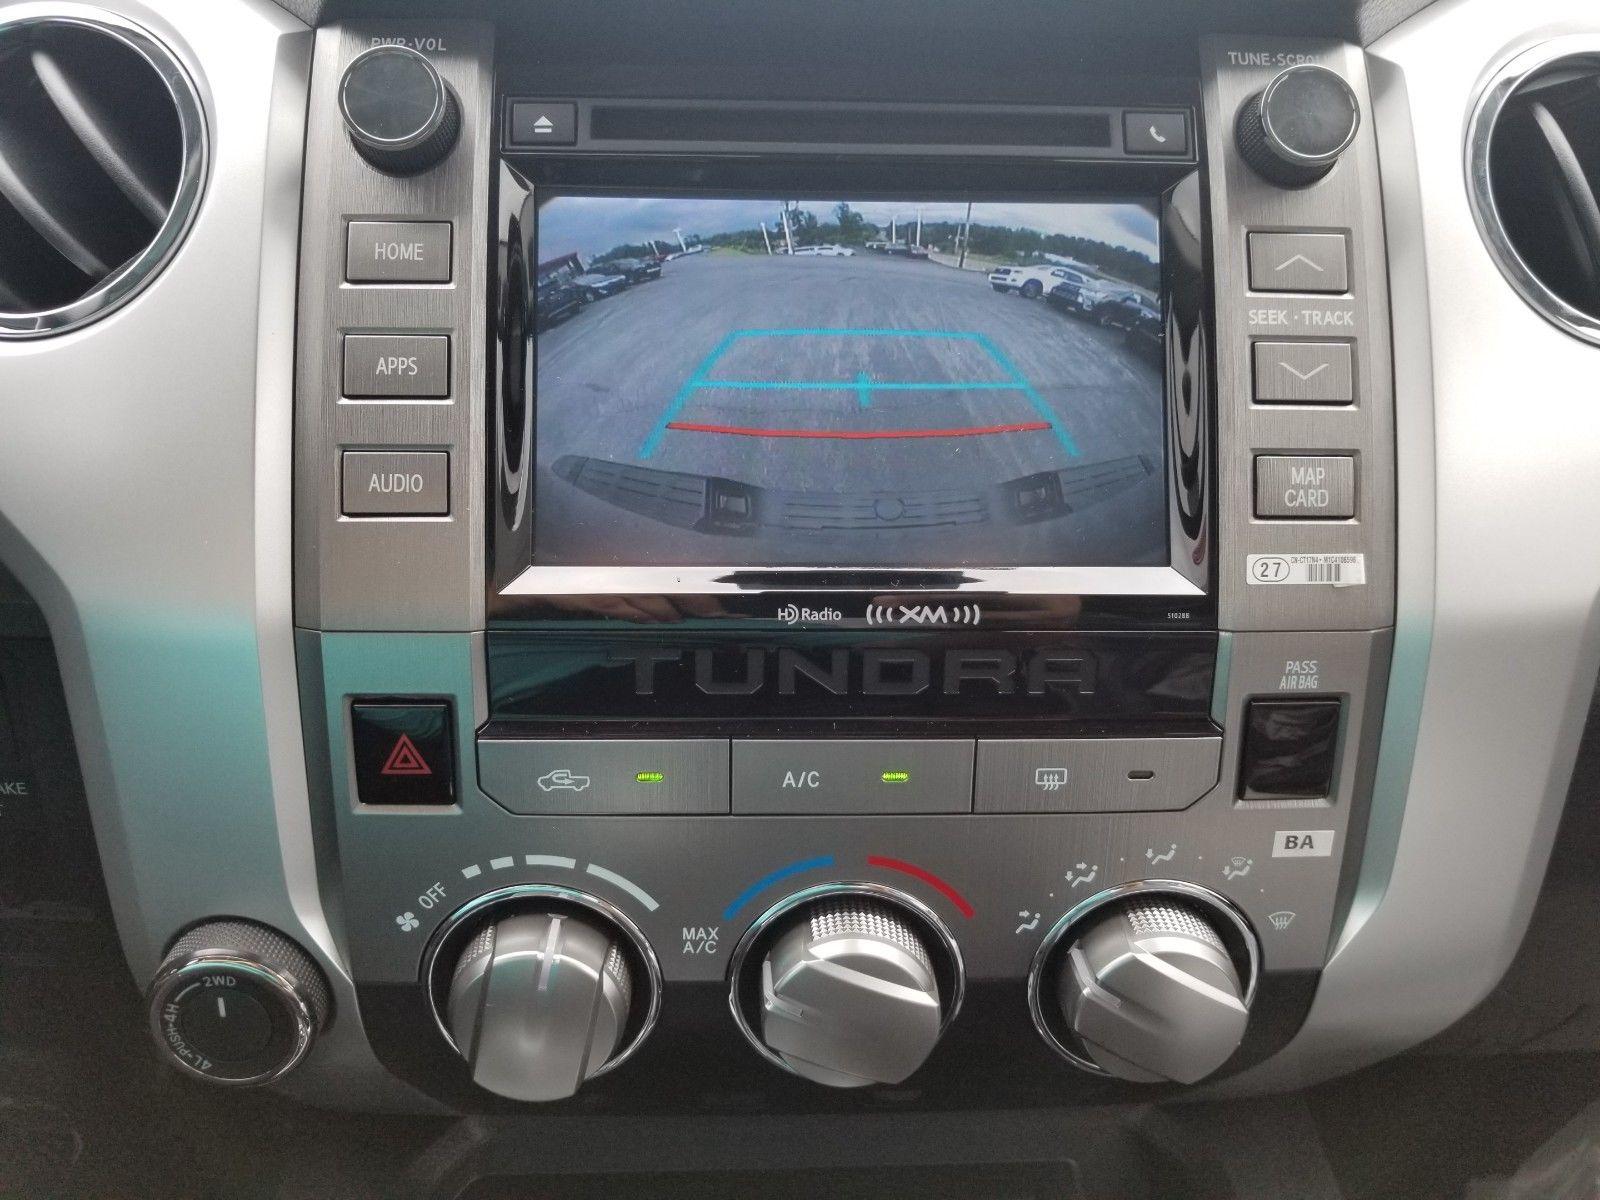 Amazing 2018 Toyota Tundra 2018 Crewmax 5.7L V8 4WD SR5 ...